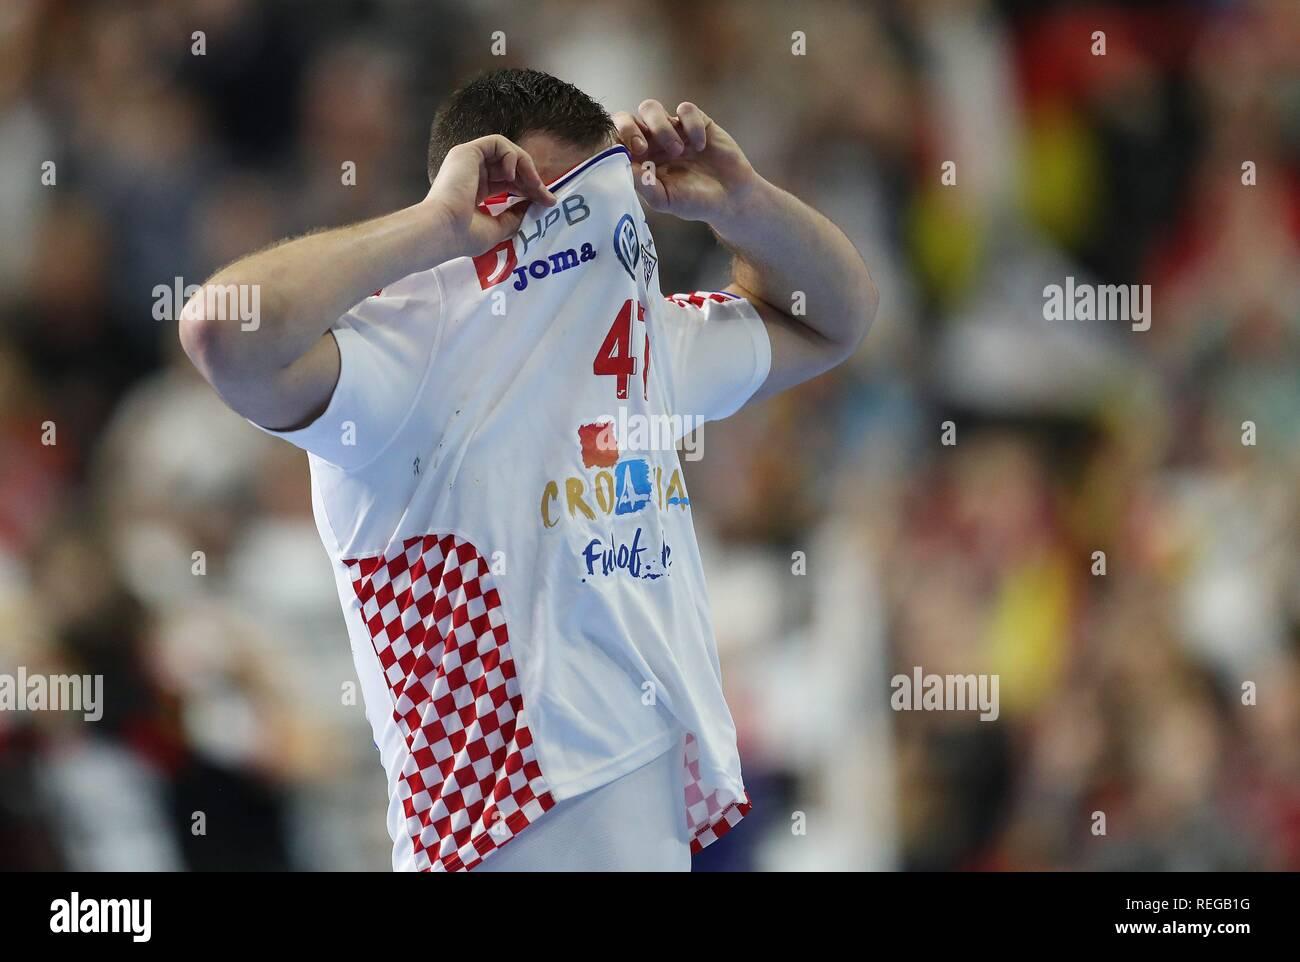 firo: 21.01.2019, Handball: World Cup World Cup Main Round Croatia Croatia - Germany 21:22 Disconnected, Jakov Vrankovic, CRO   usage worldwide - Stock Image